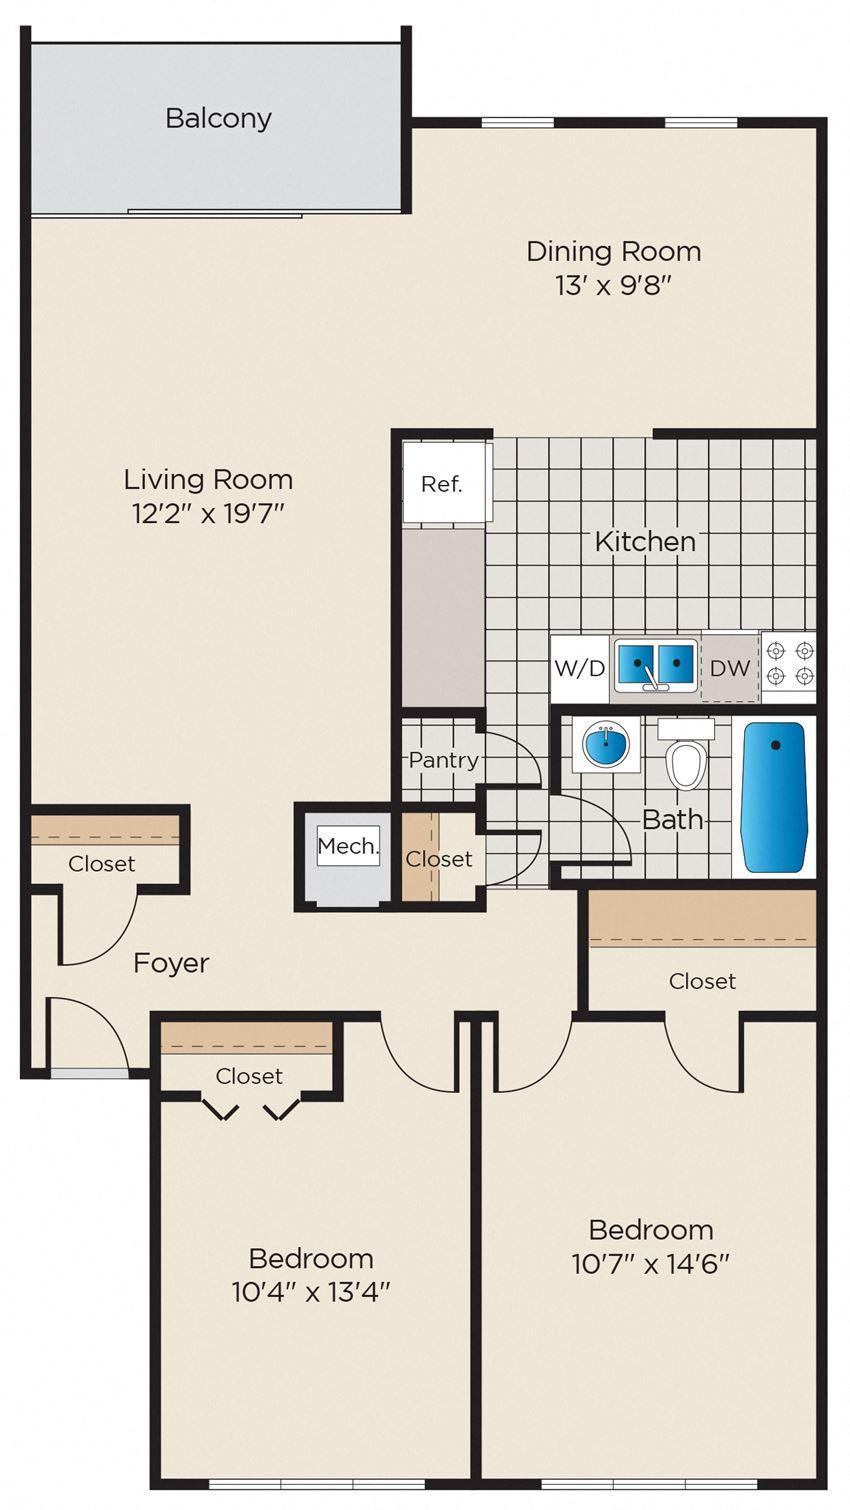 2 Bedroom, 1 Bath - Upgraded